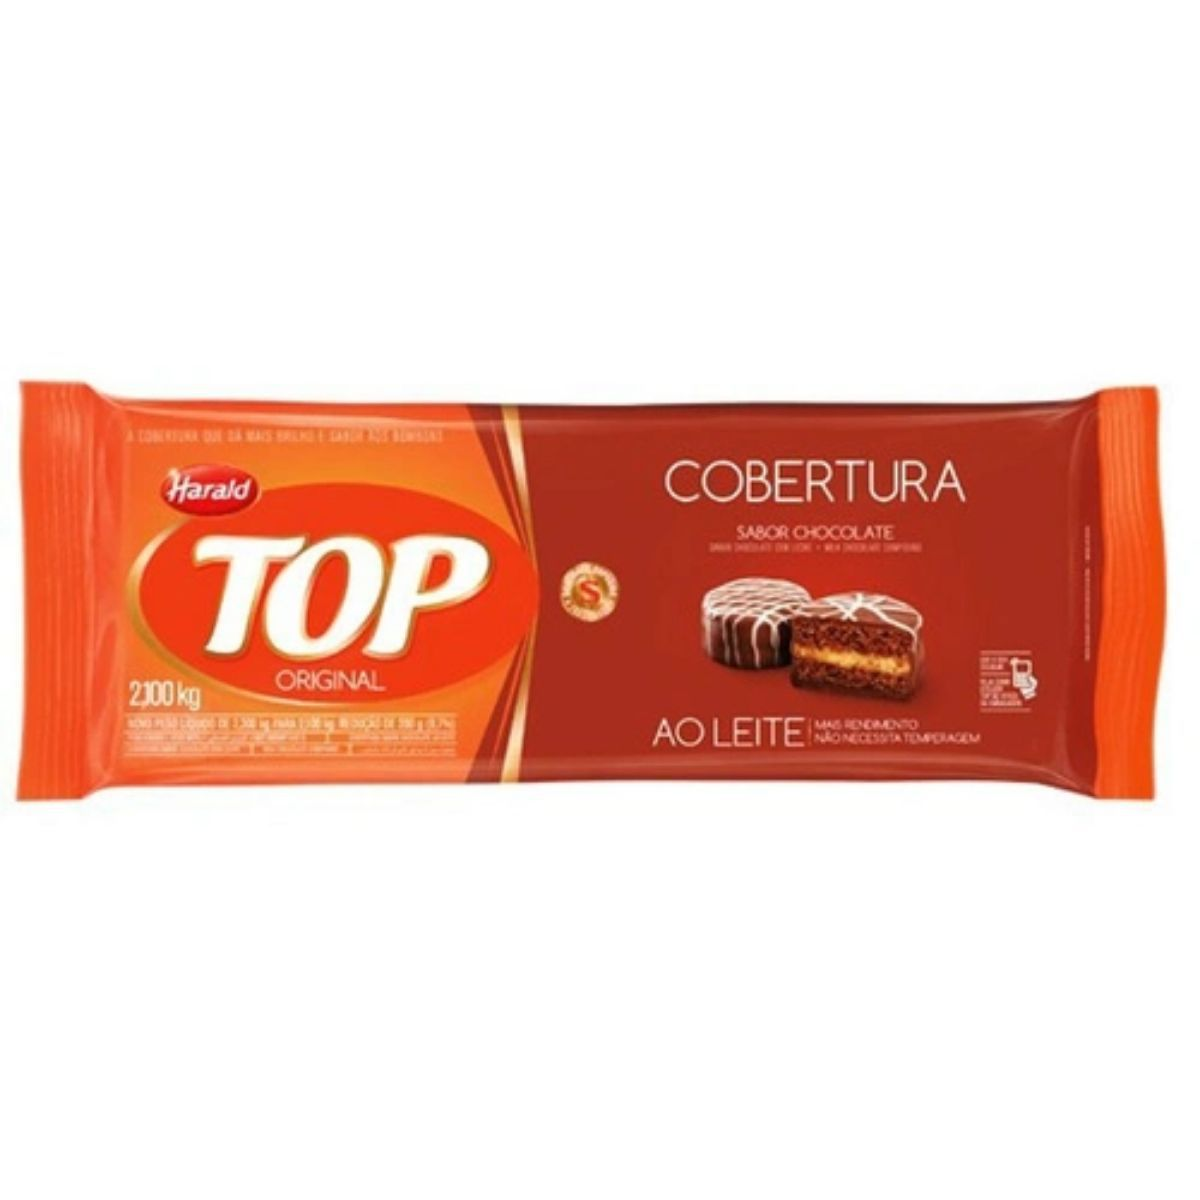 Cobertura Fracionada sabor Chocolate Ao Leite 2,1 kg Top Harald